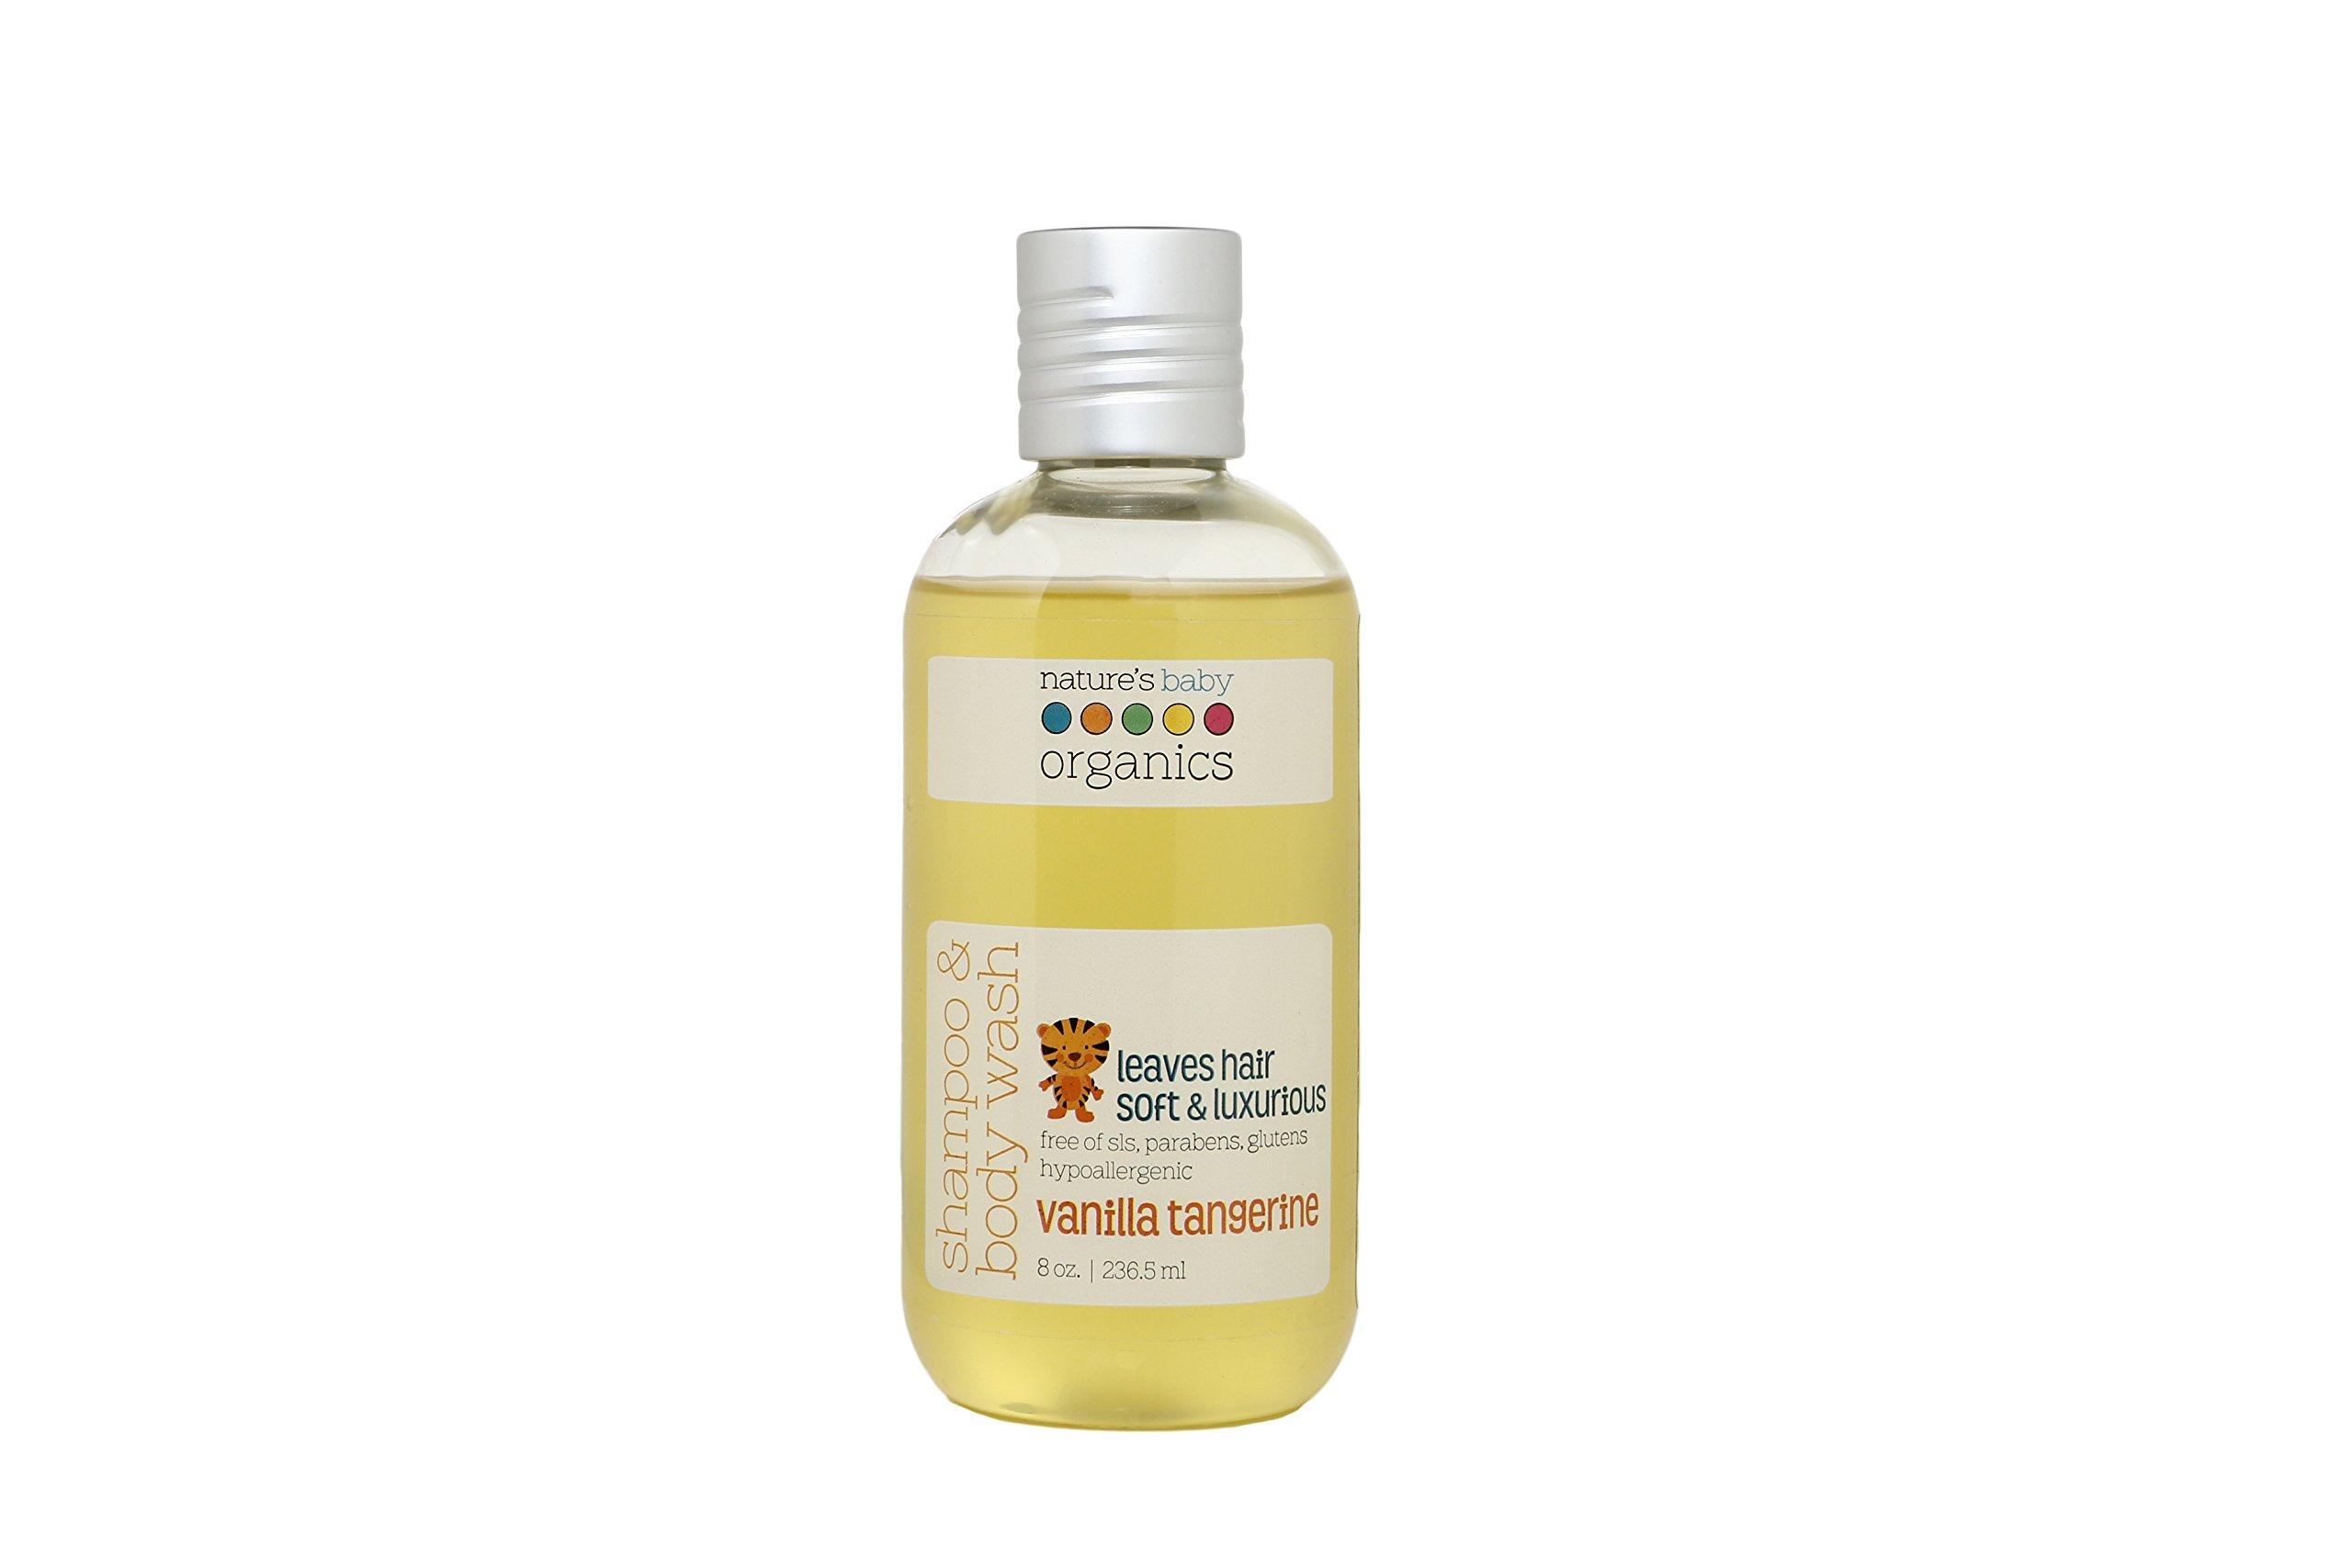 Nature's Baby Organics Shampoo & Body Wash, Vanilla Tangerine, 8 oz   Babies, Kids, & Adults! Natural, Moisturizing, Soft, Gentle, Rich, Hypoallergenic   No Chemicals, Parabens, SLS, Glutens